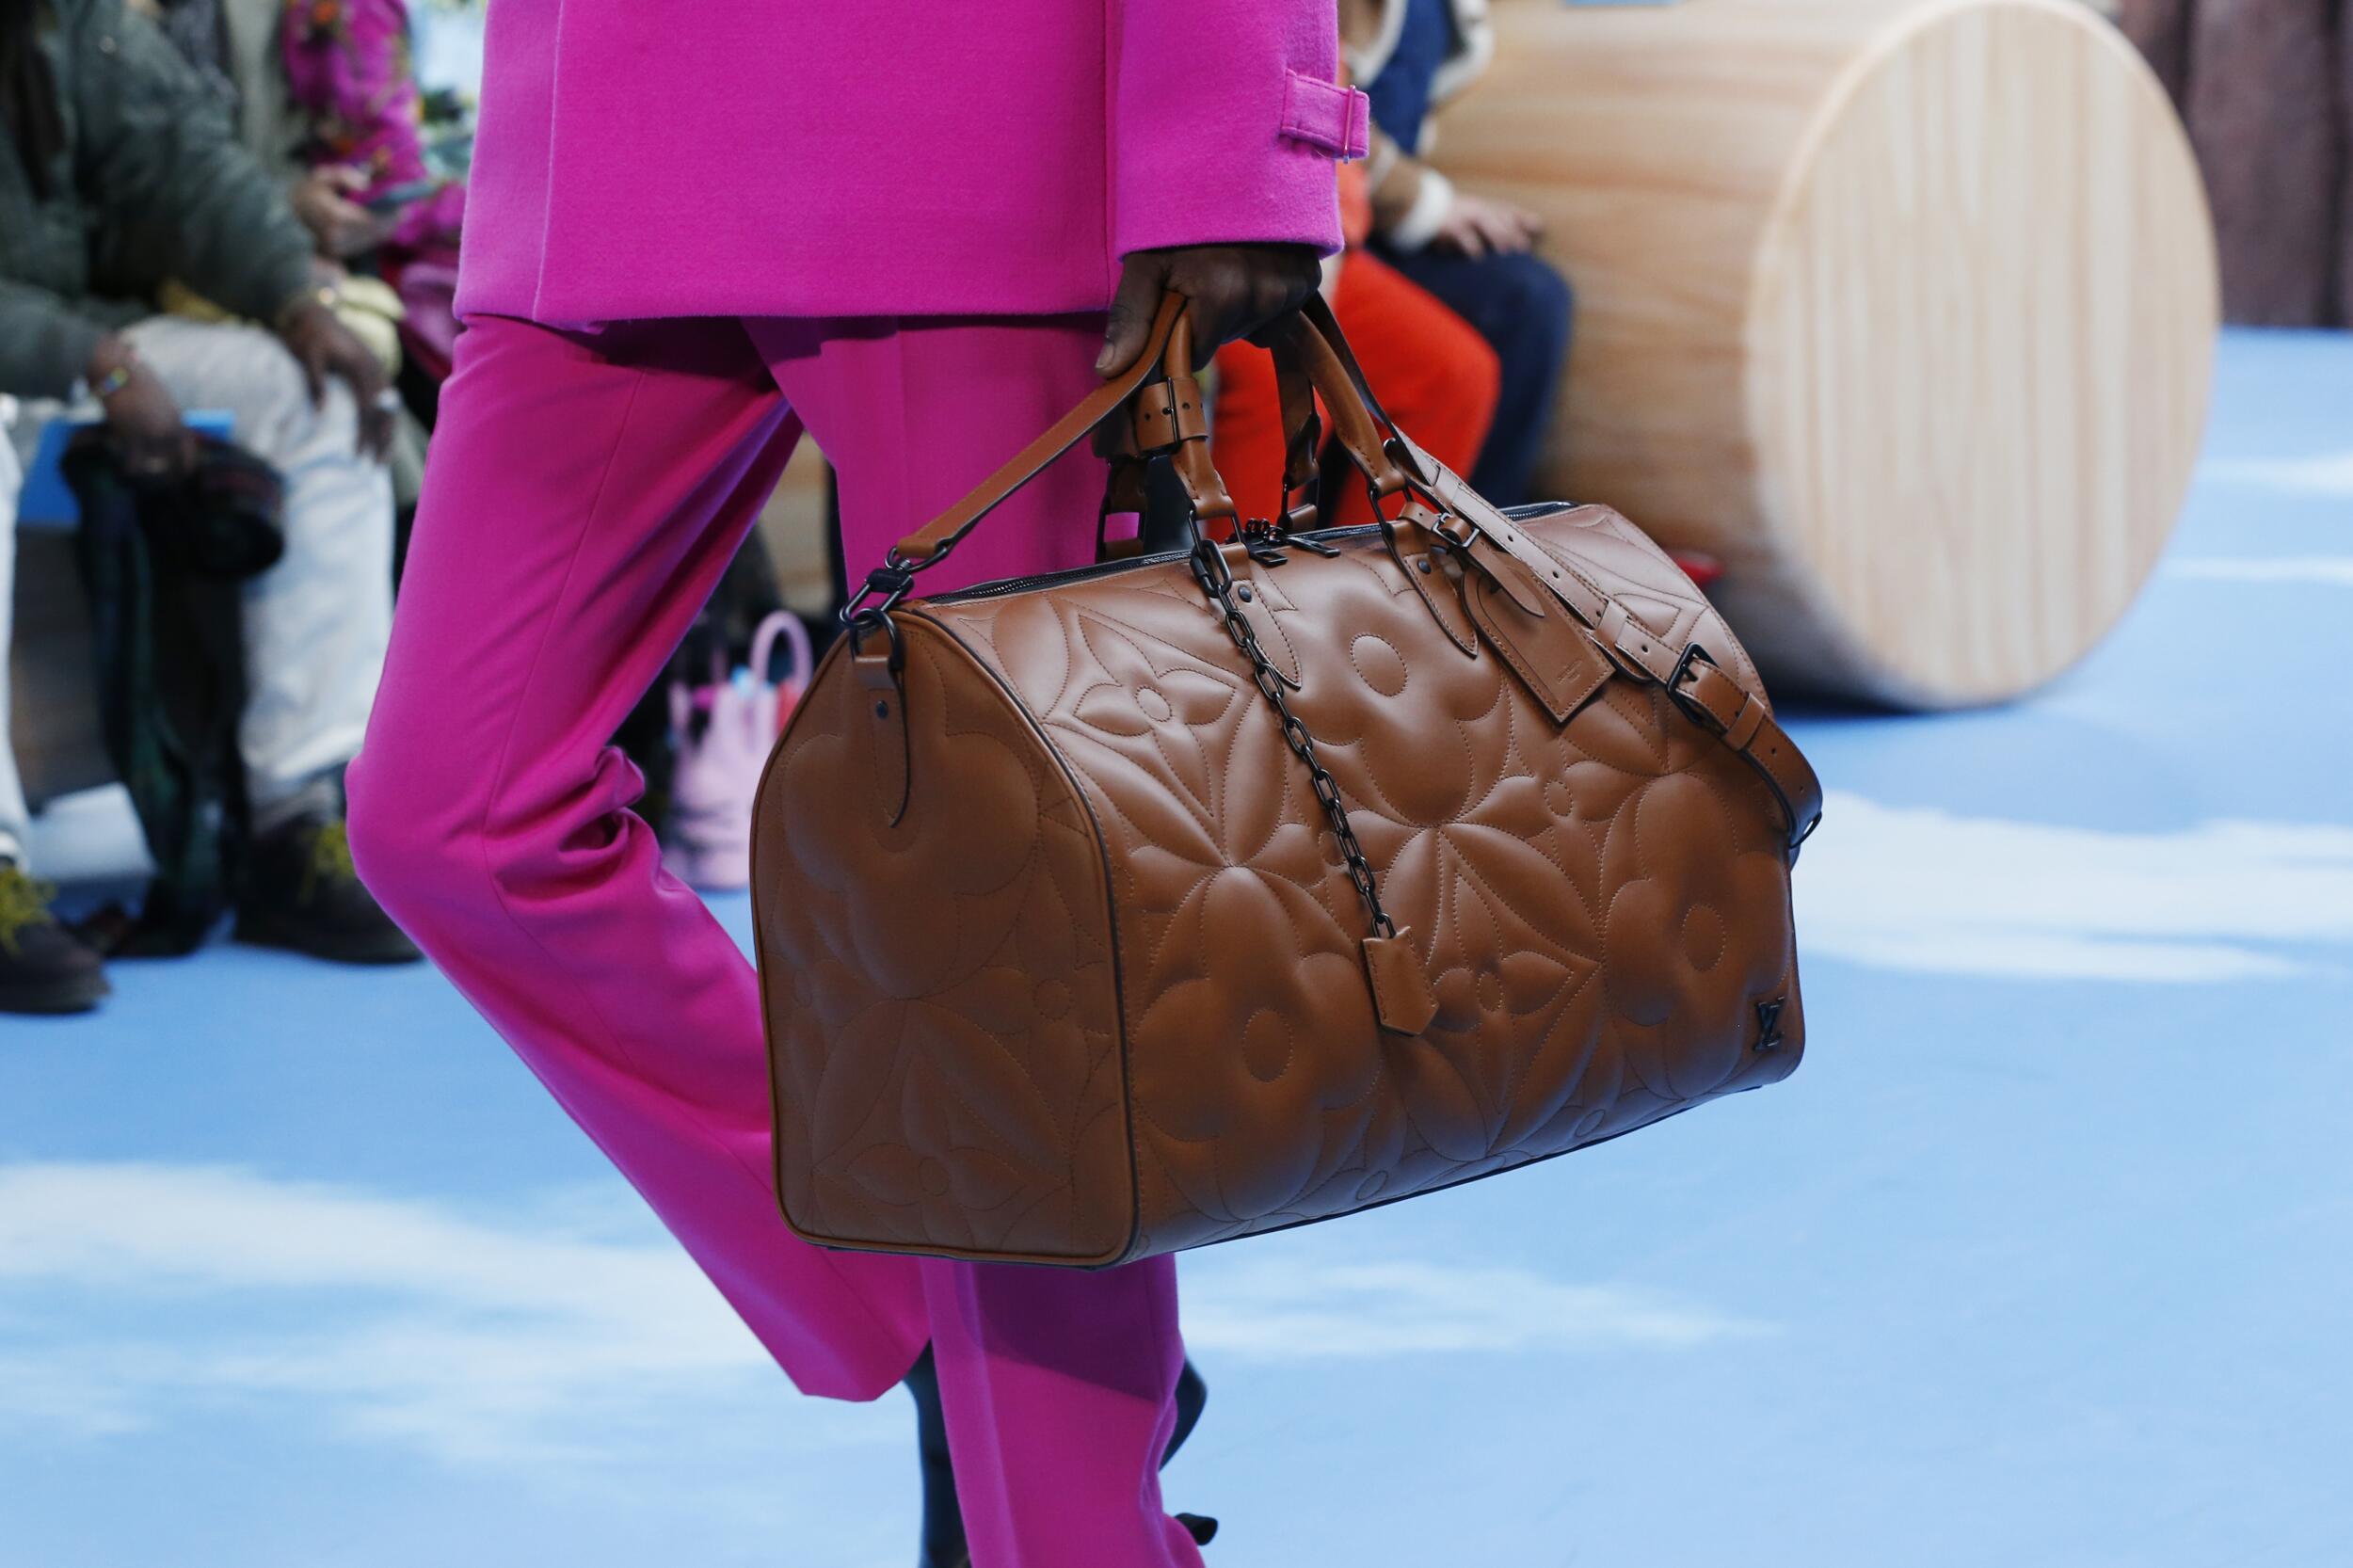 Louis Vuitton Paris Fashion Week Bag